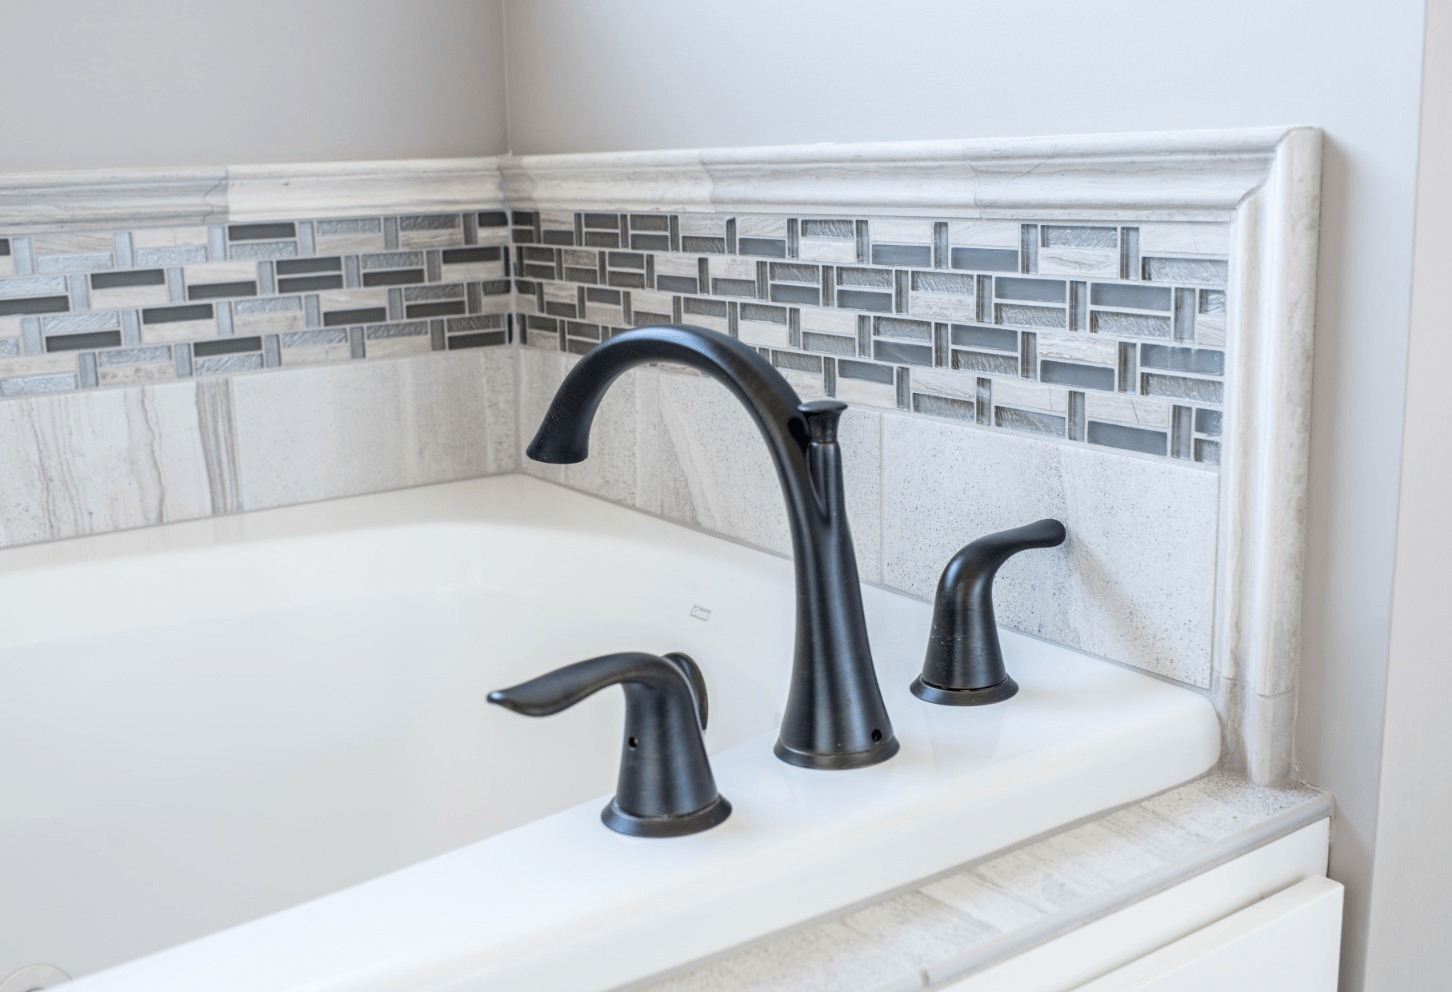 Wash basin tiles | Johnston Paint & Decorating